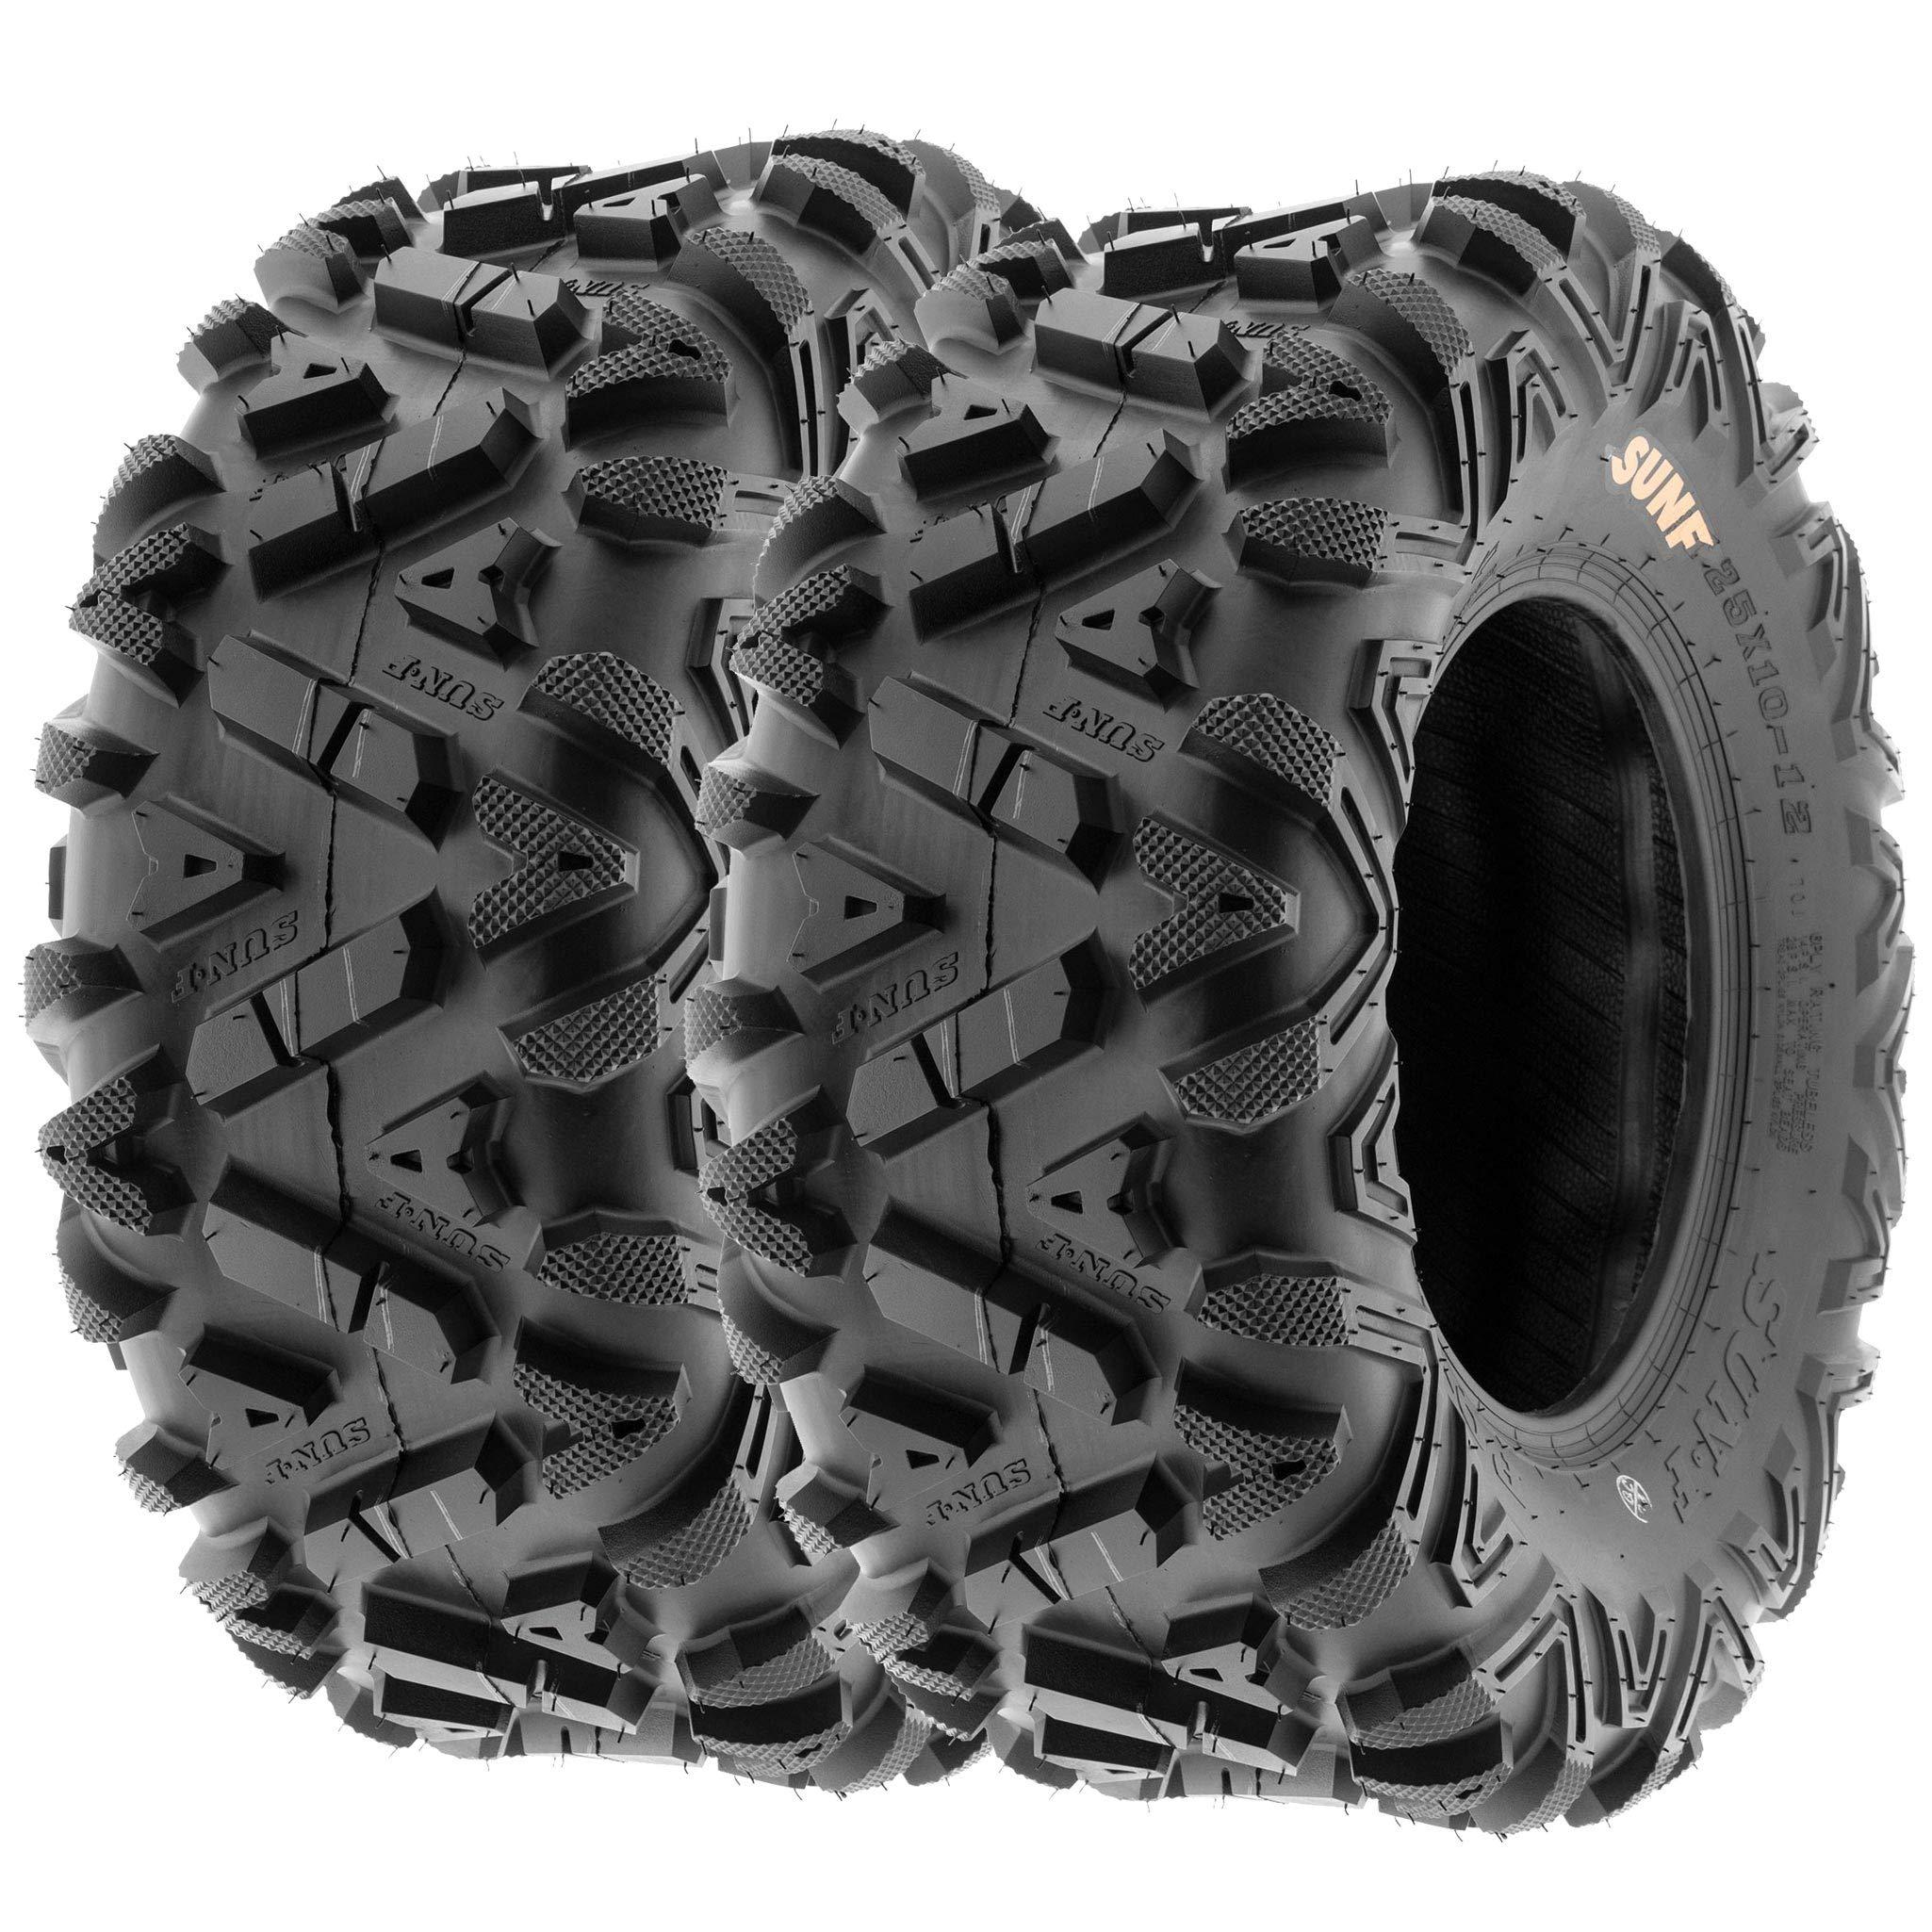 Set of 4 SunF Power.I ATV/UTV AT all-terrain Tires 24x8-11 Front & 24x11-10 Rear, 6 PR, Tubeless A033 by SUNF (Image #3)